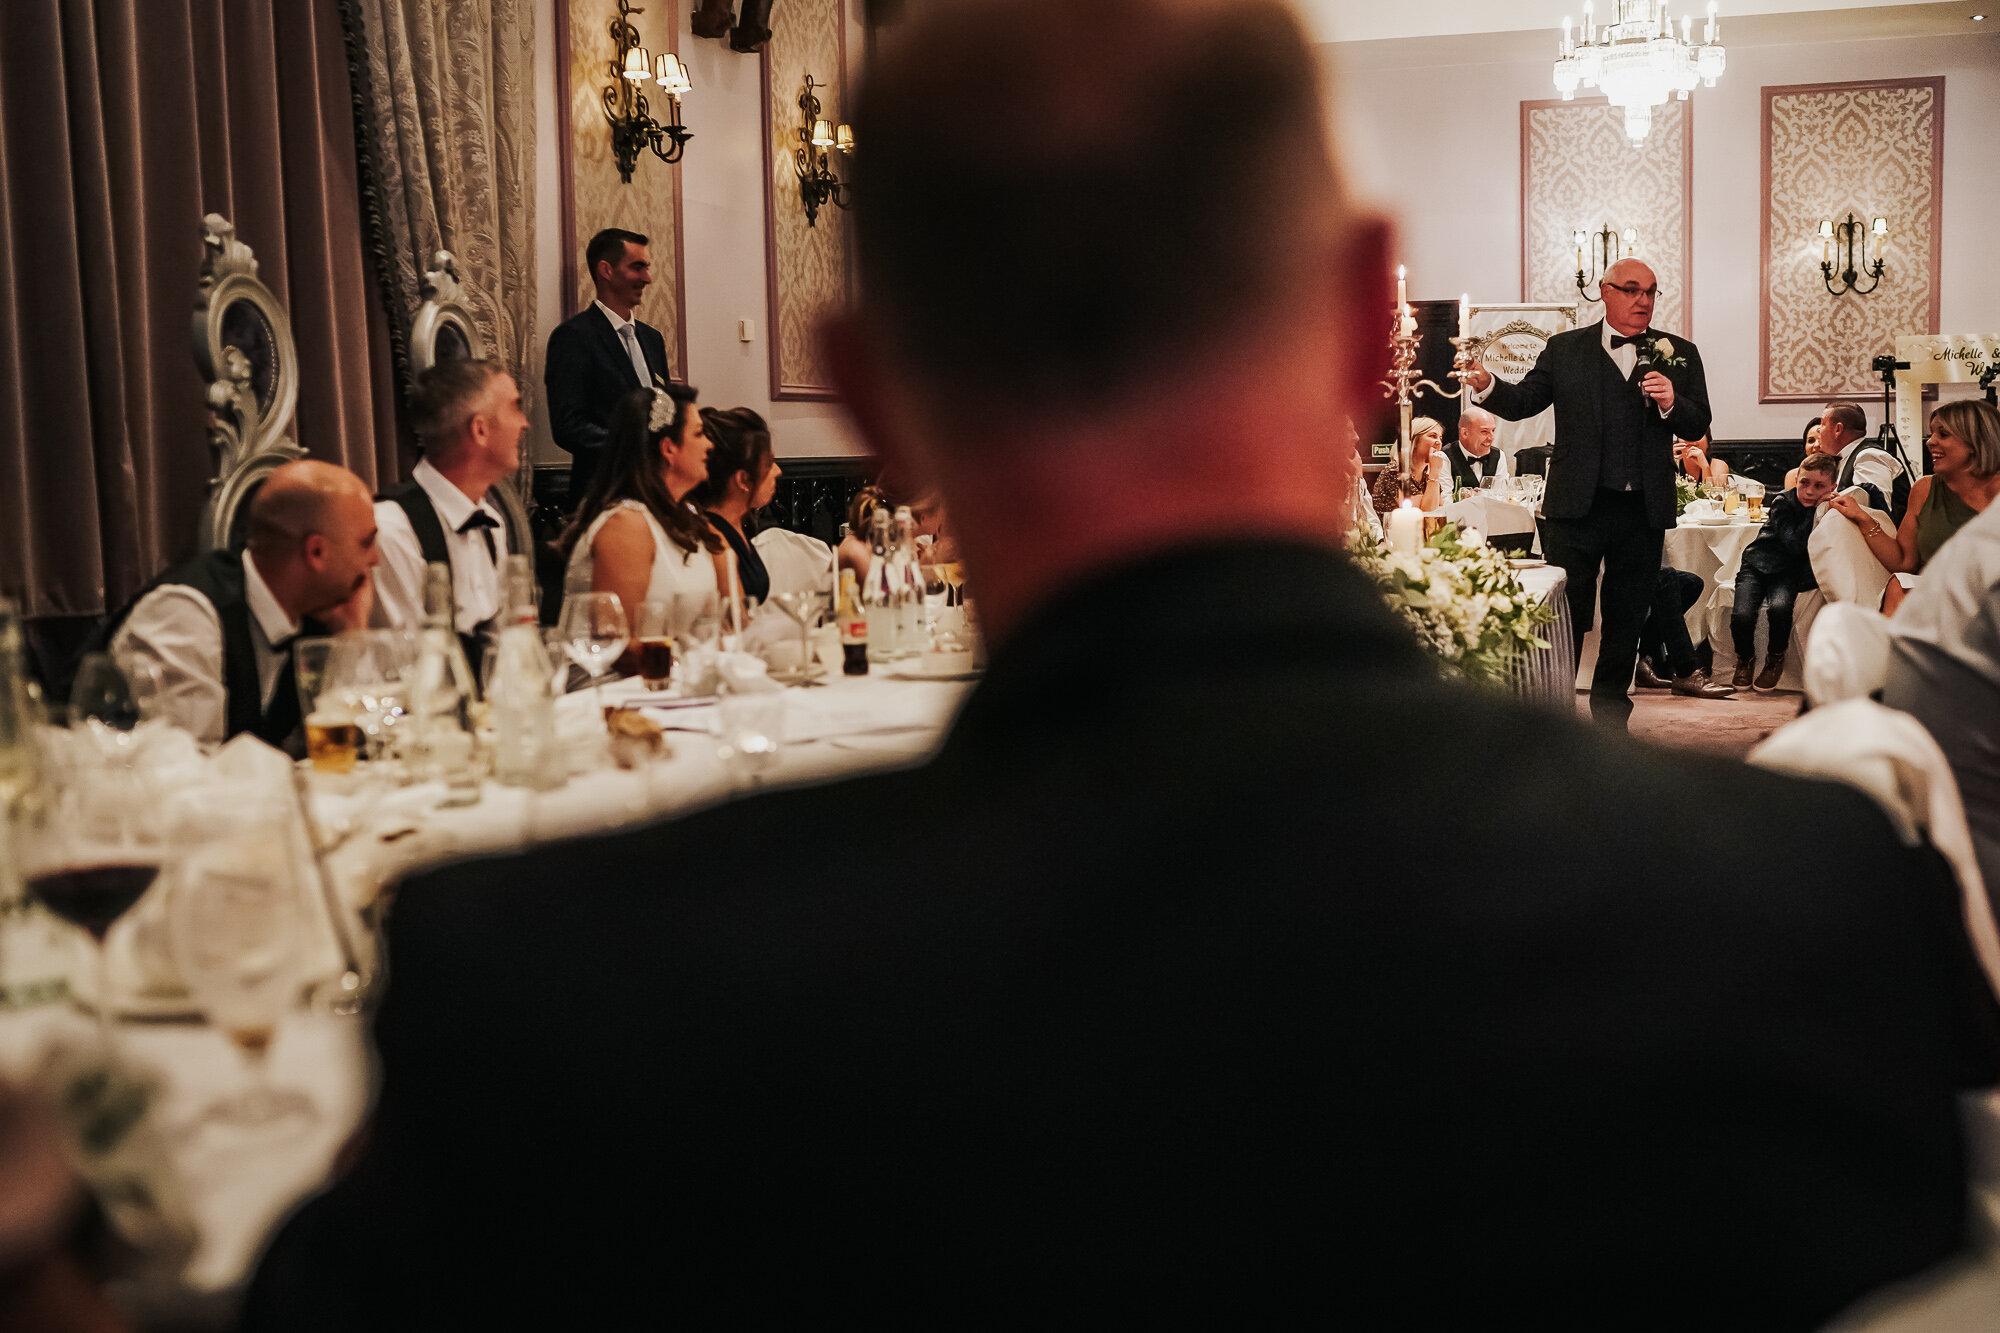 Clontarf Caste wedding photographer Wedding Photography dublin ireland wedding photographer (51 of 58).jpg